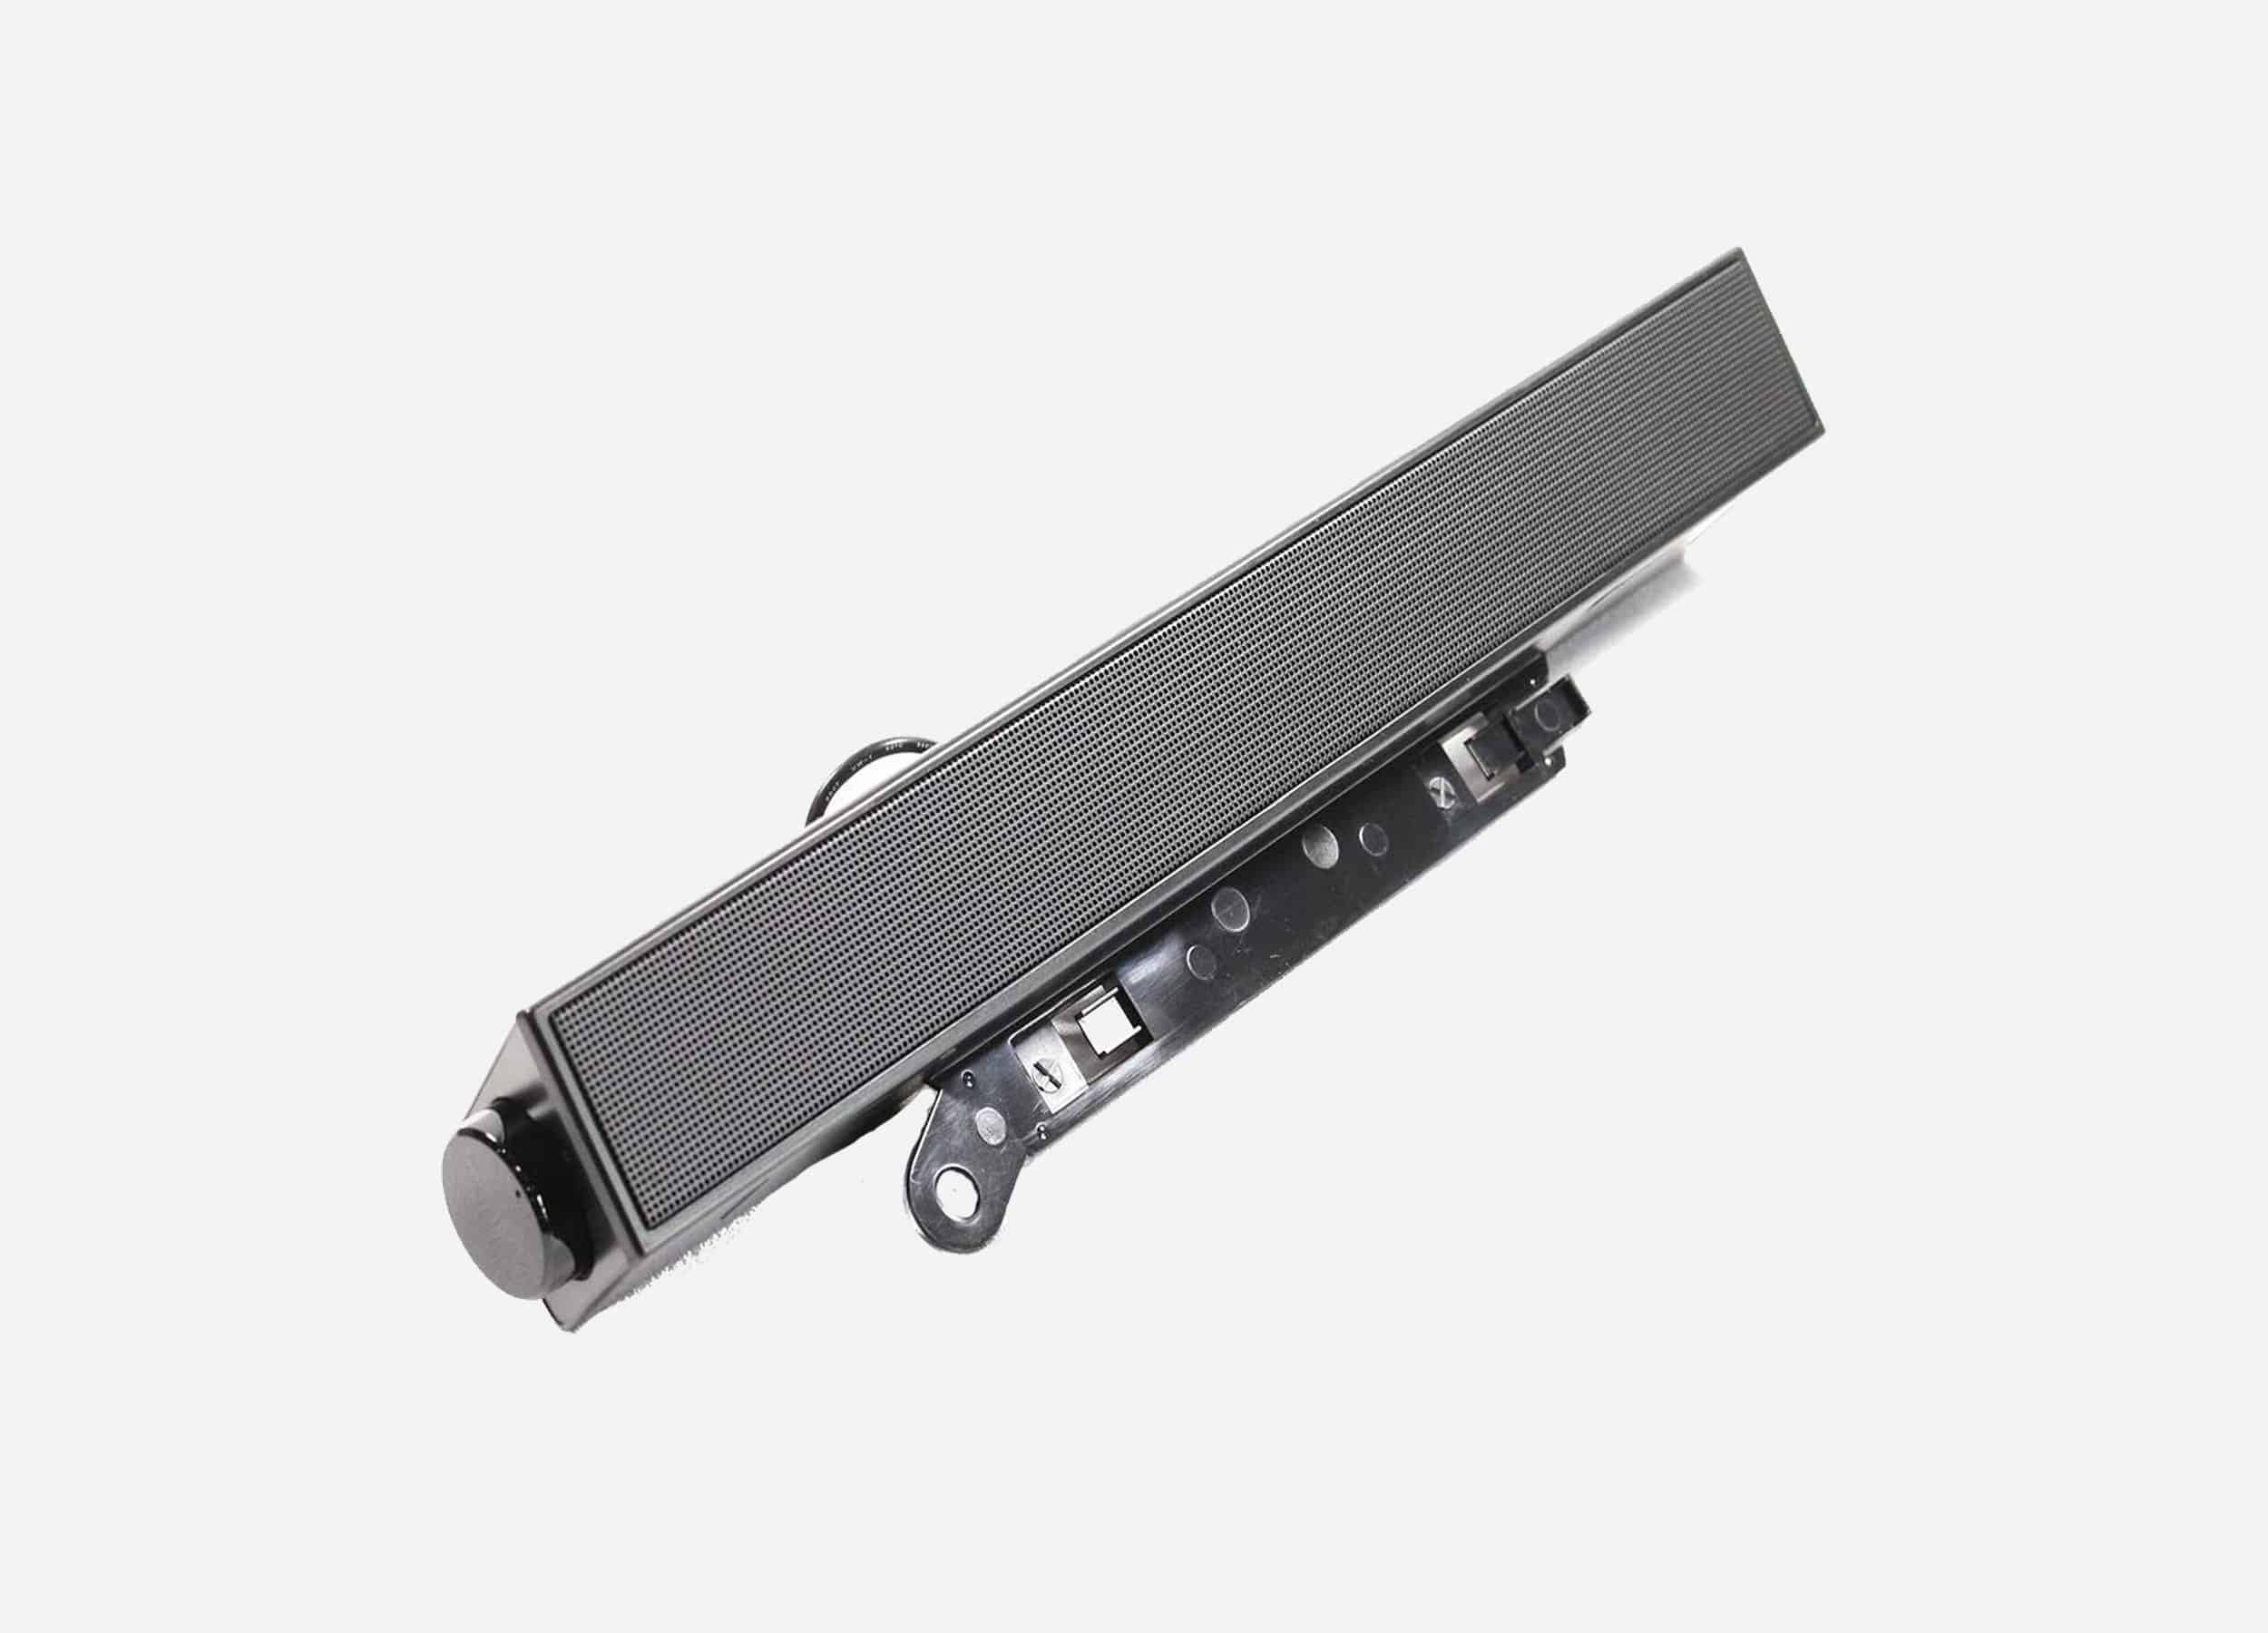 Dell AX510 Stereo Soundbar